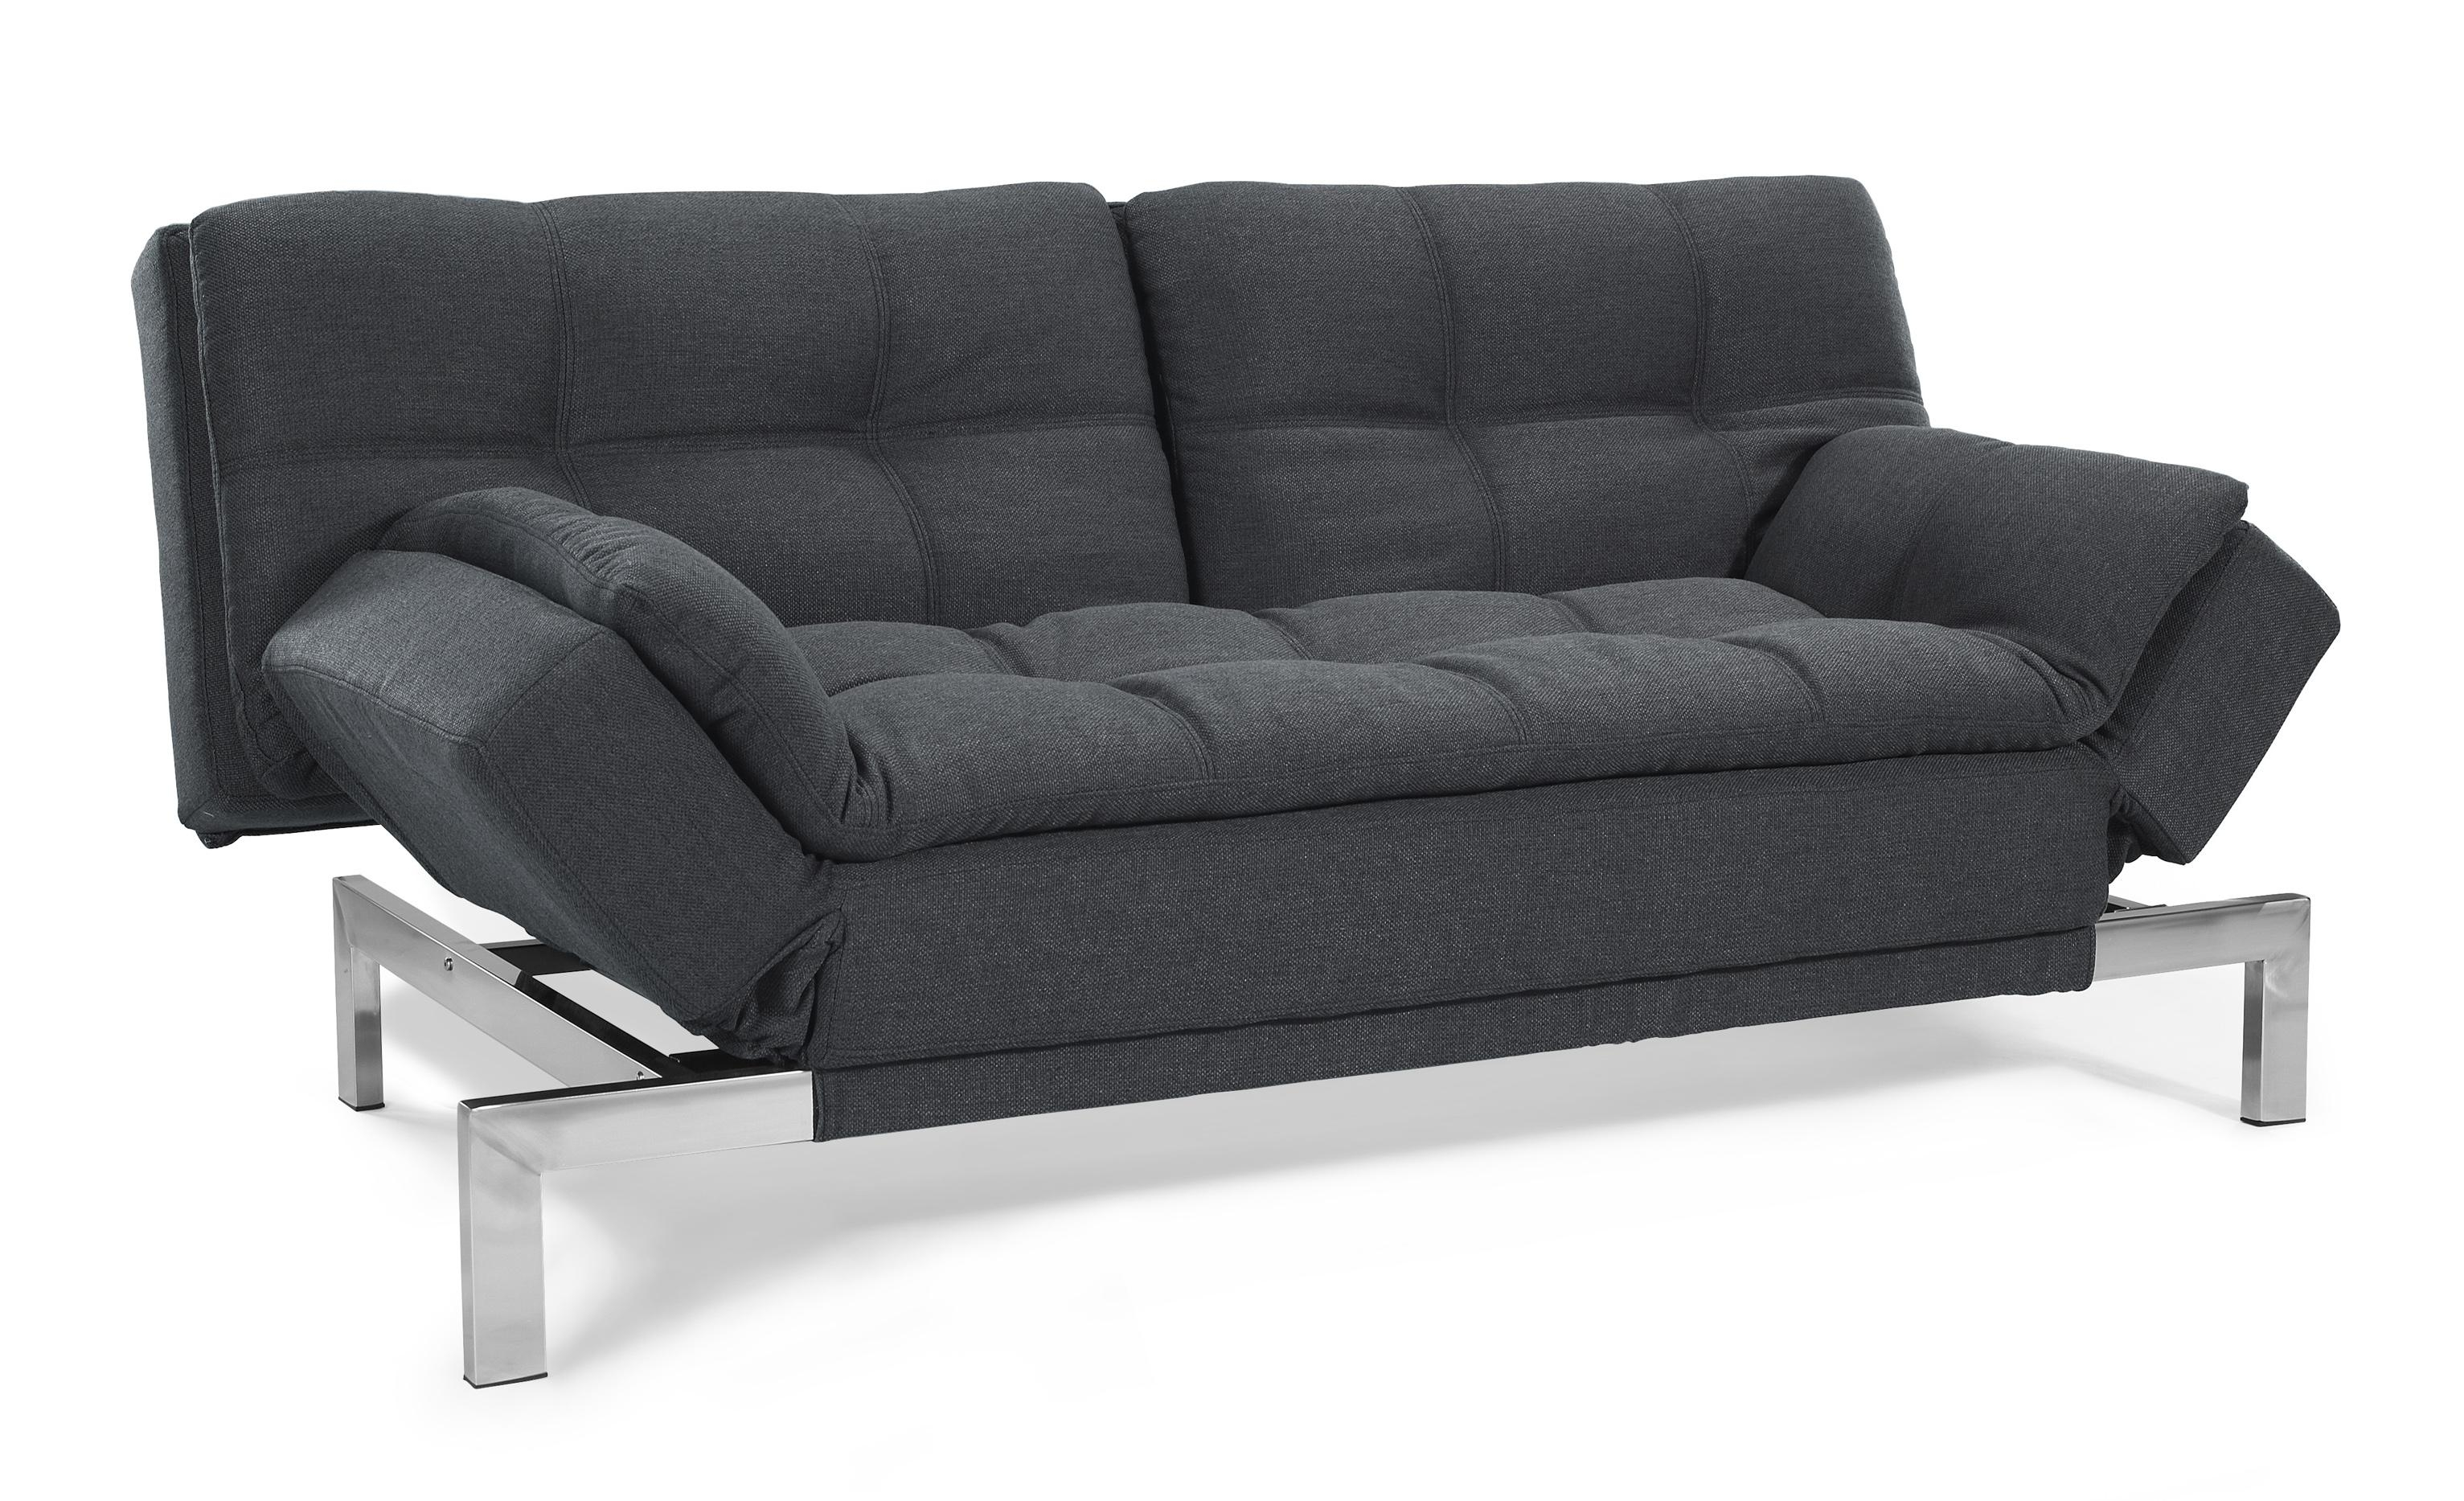 Lifestyle Solutions Boca Serta Convertible Sofa Sabocs3U4Cc For Sofa Convertibles (View 10 of 20)